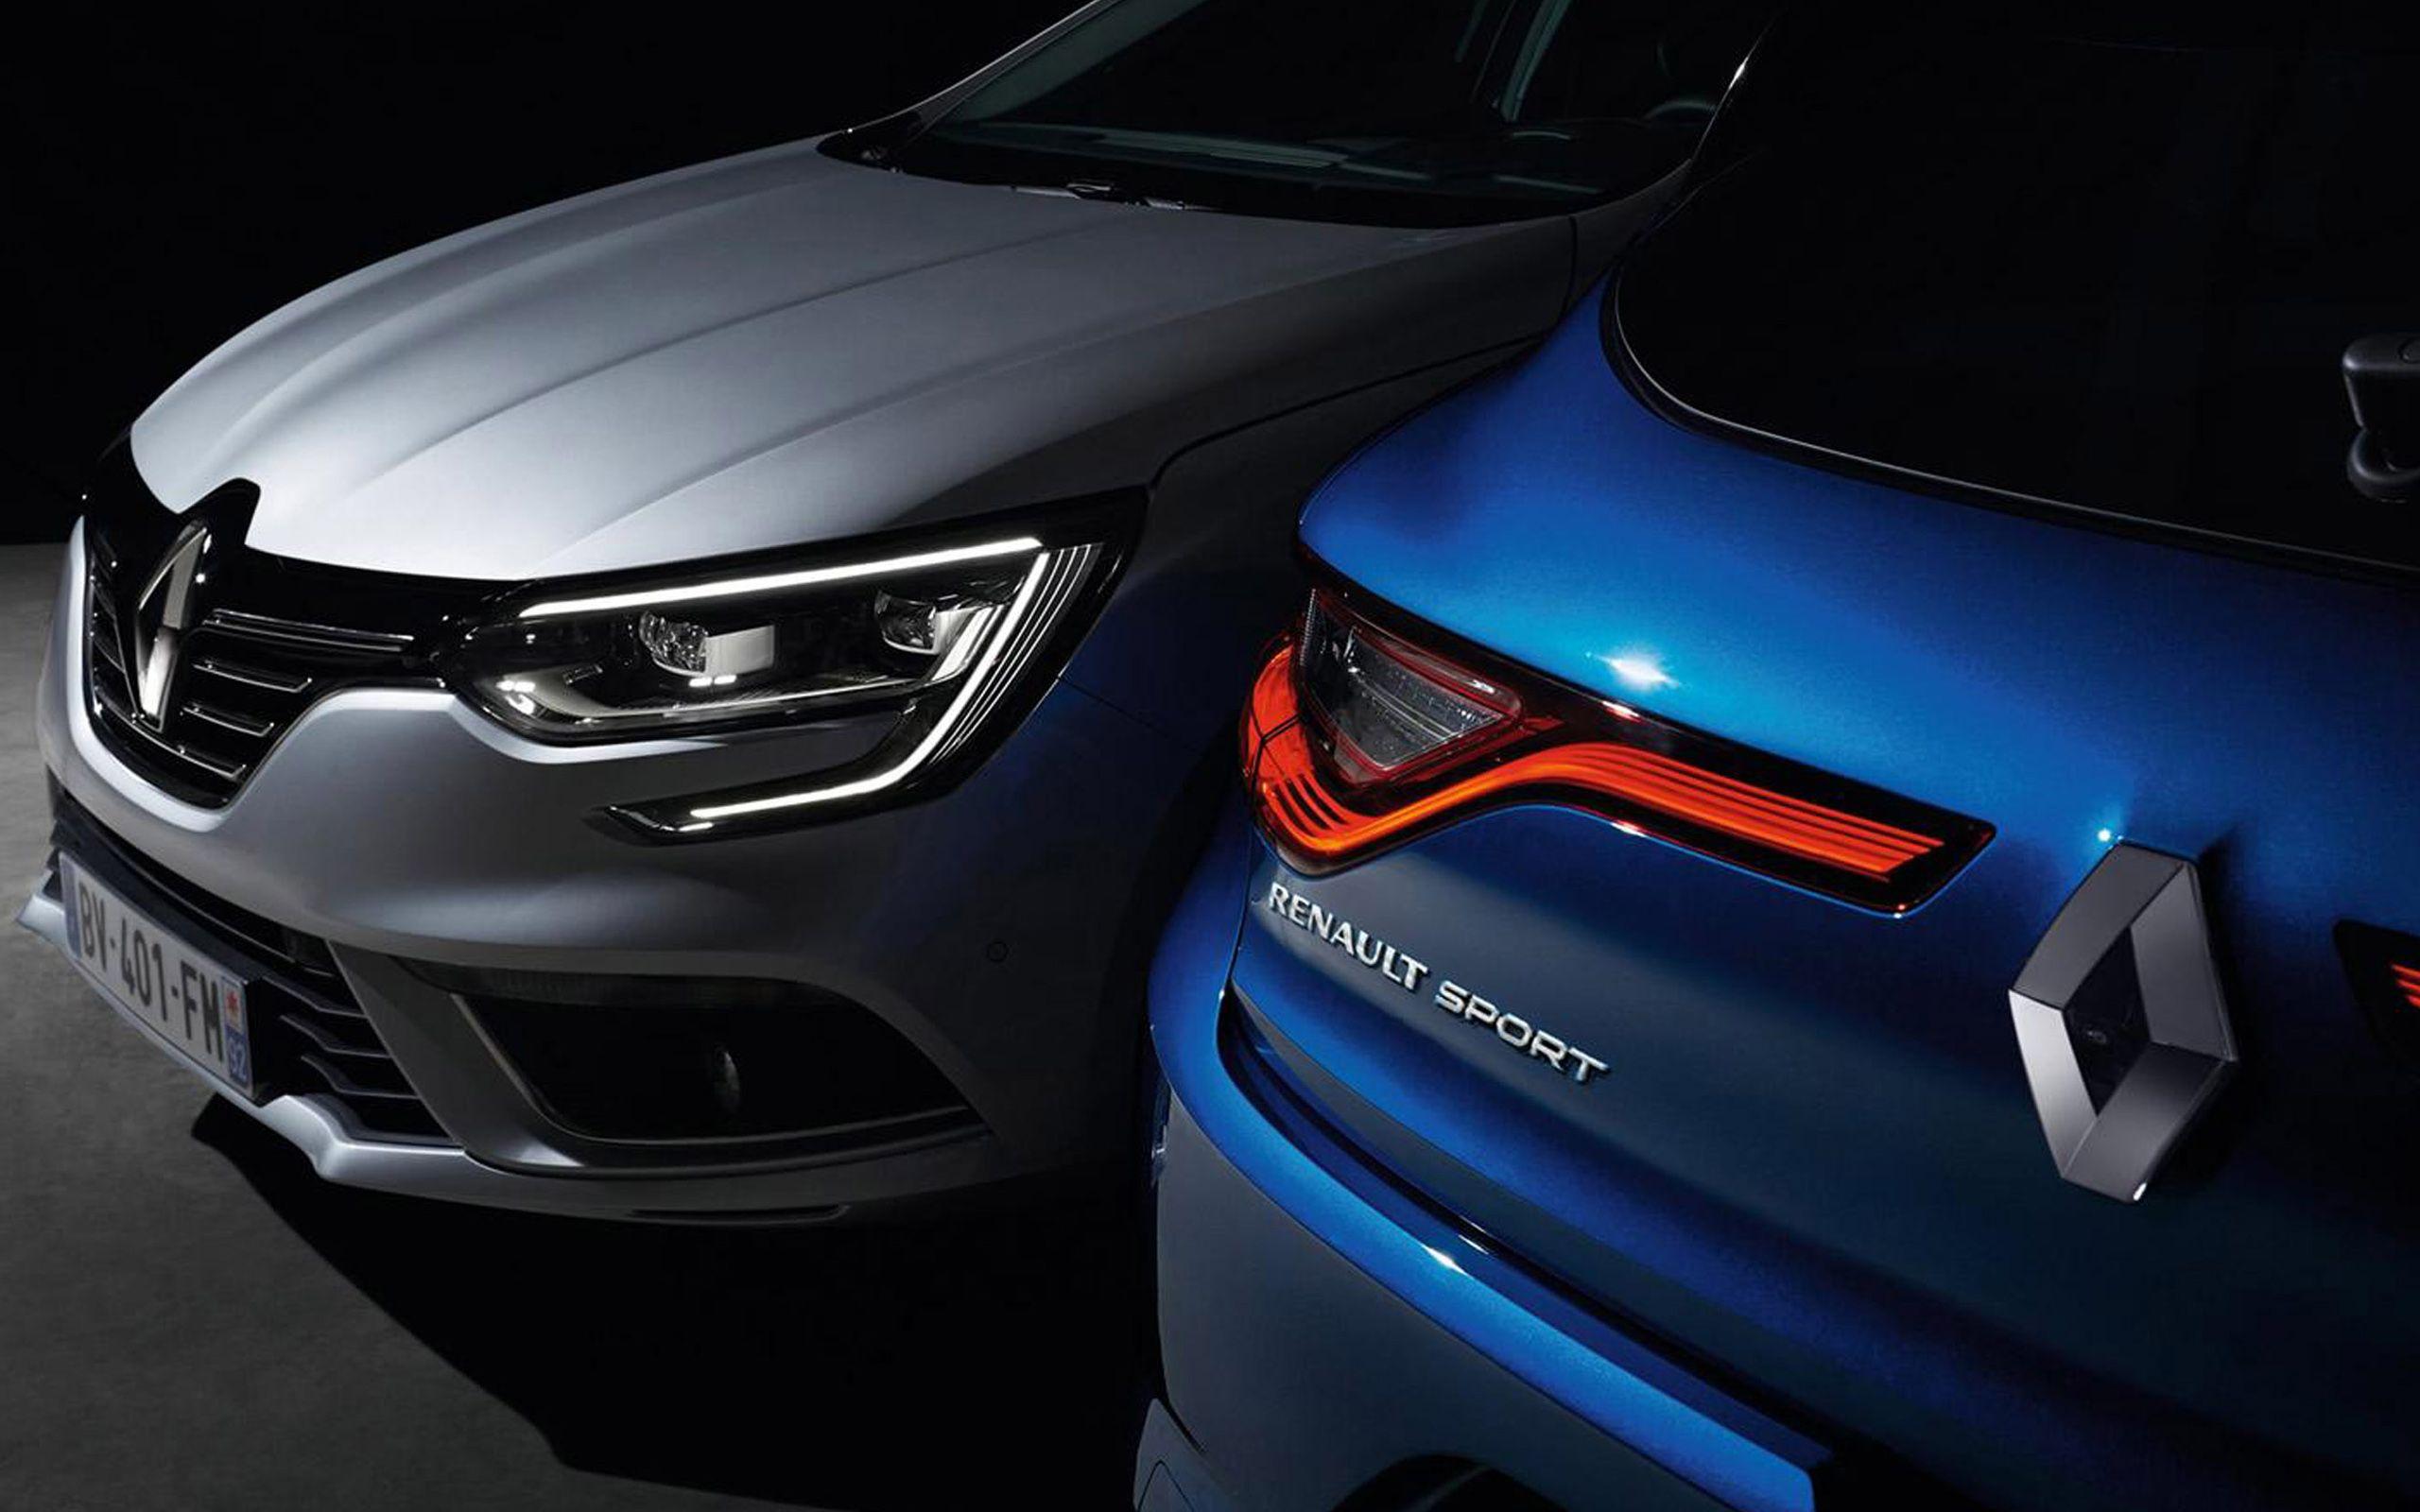 2016 Renault Megane Hd Wallpapers Auto Carros Incriveis Carros